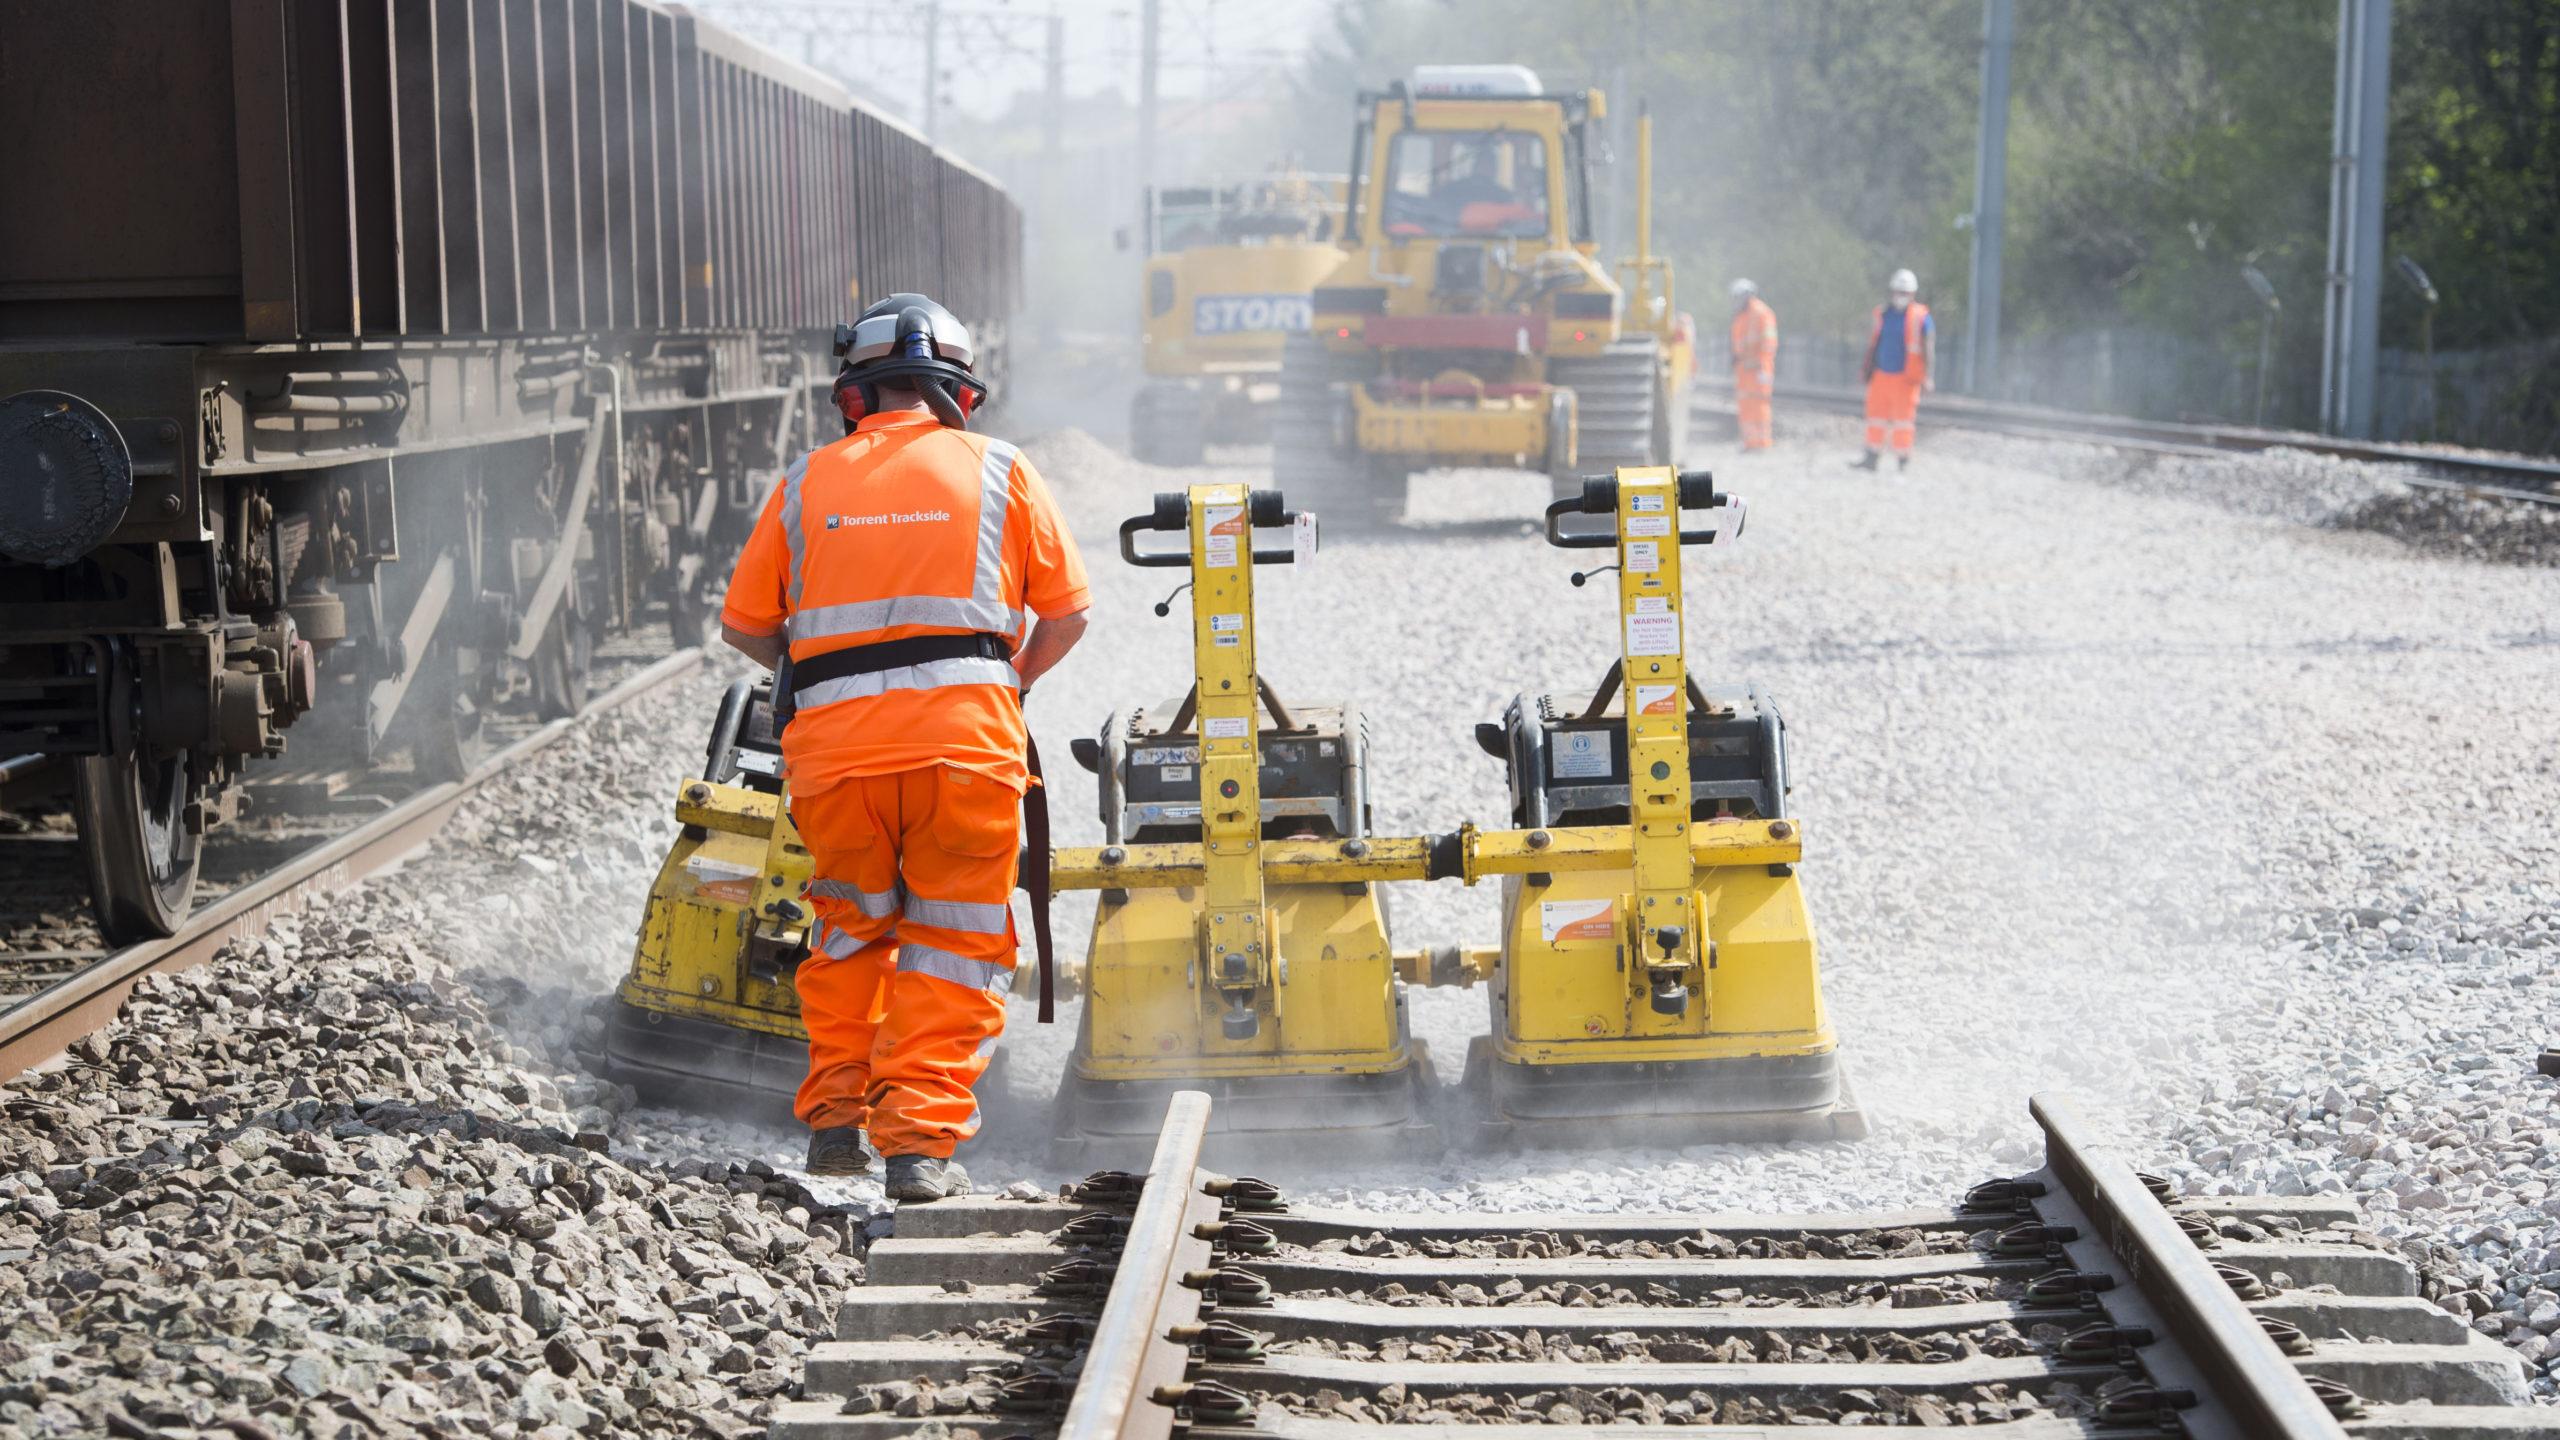 Track renewal works on the West Coast Main Line